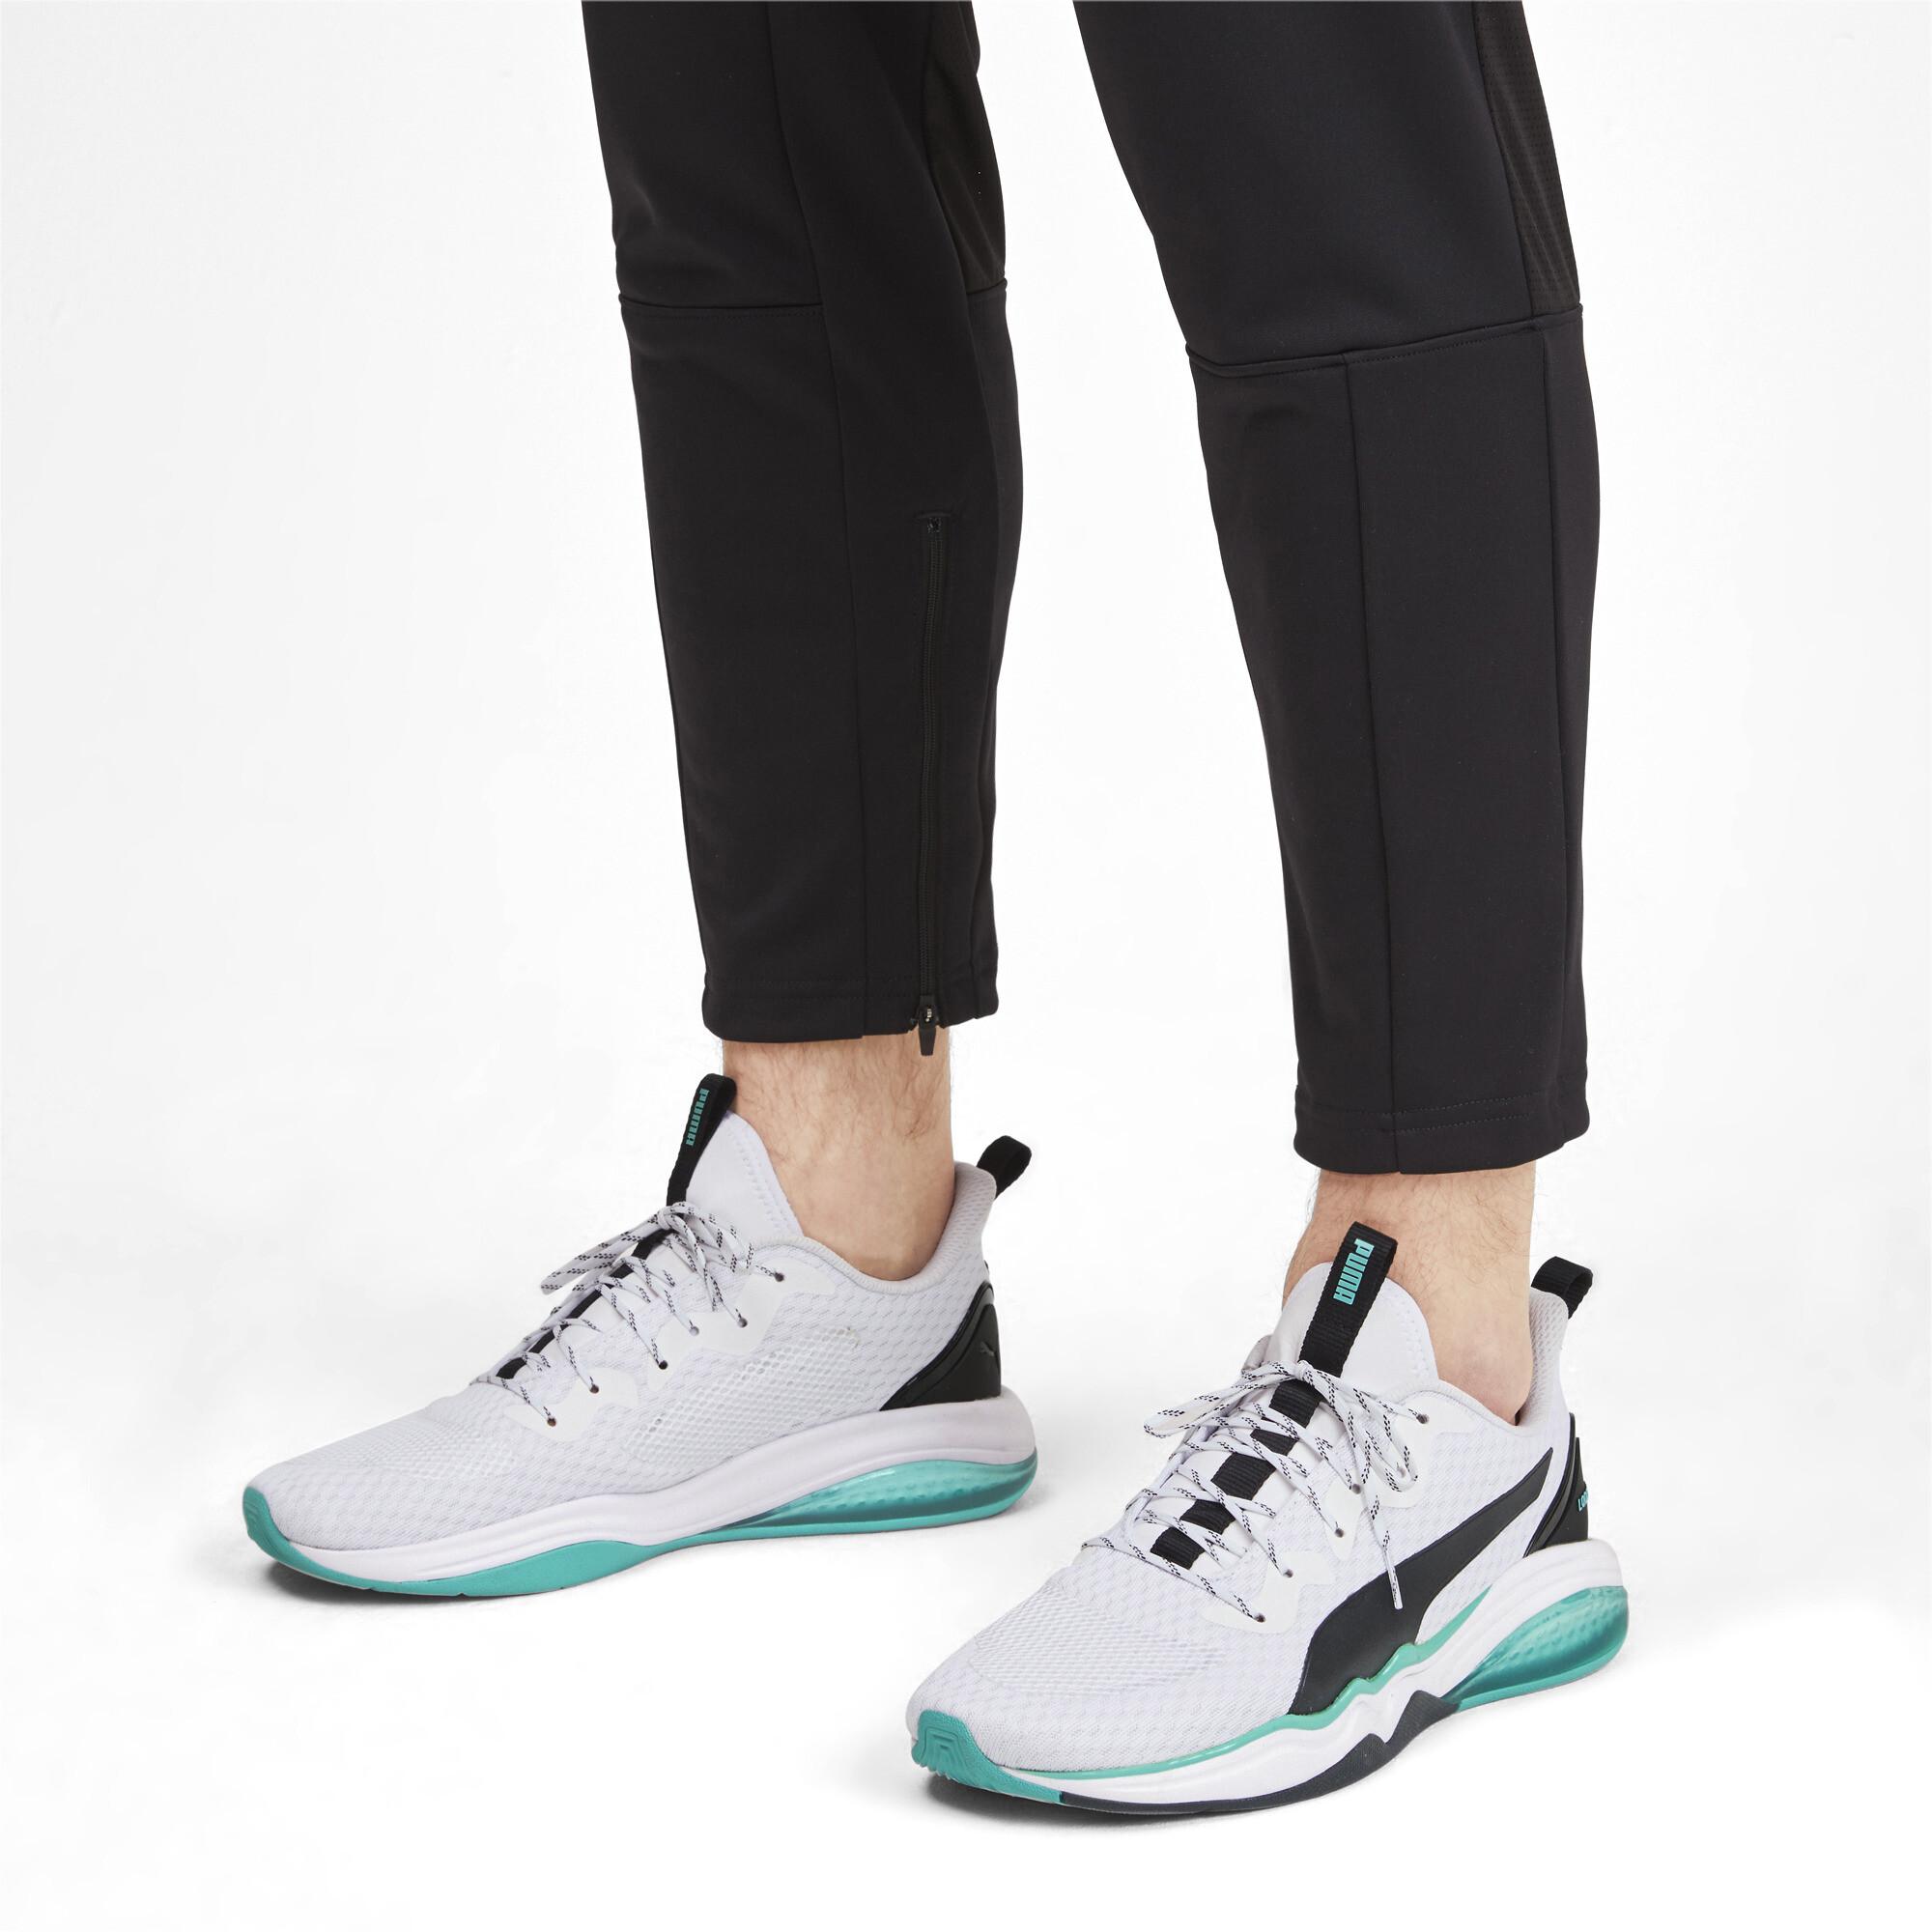 PUMA-Men-039-s-LQDCELL-Tension-Training-Shoes thumbnail 5